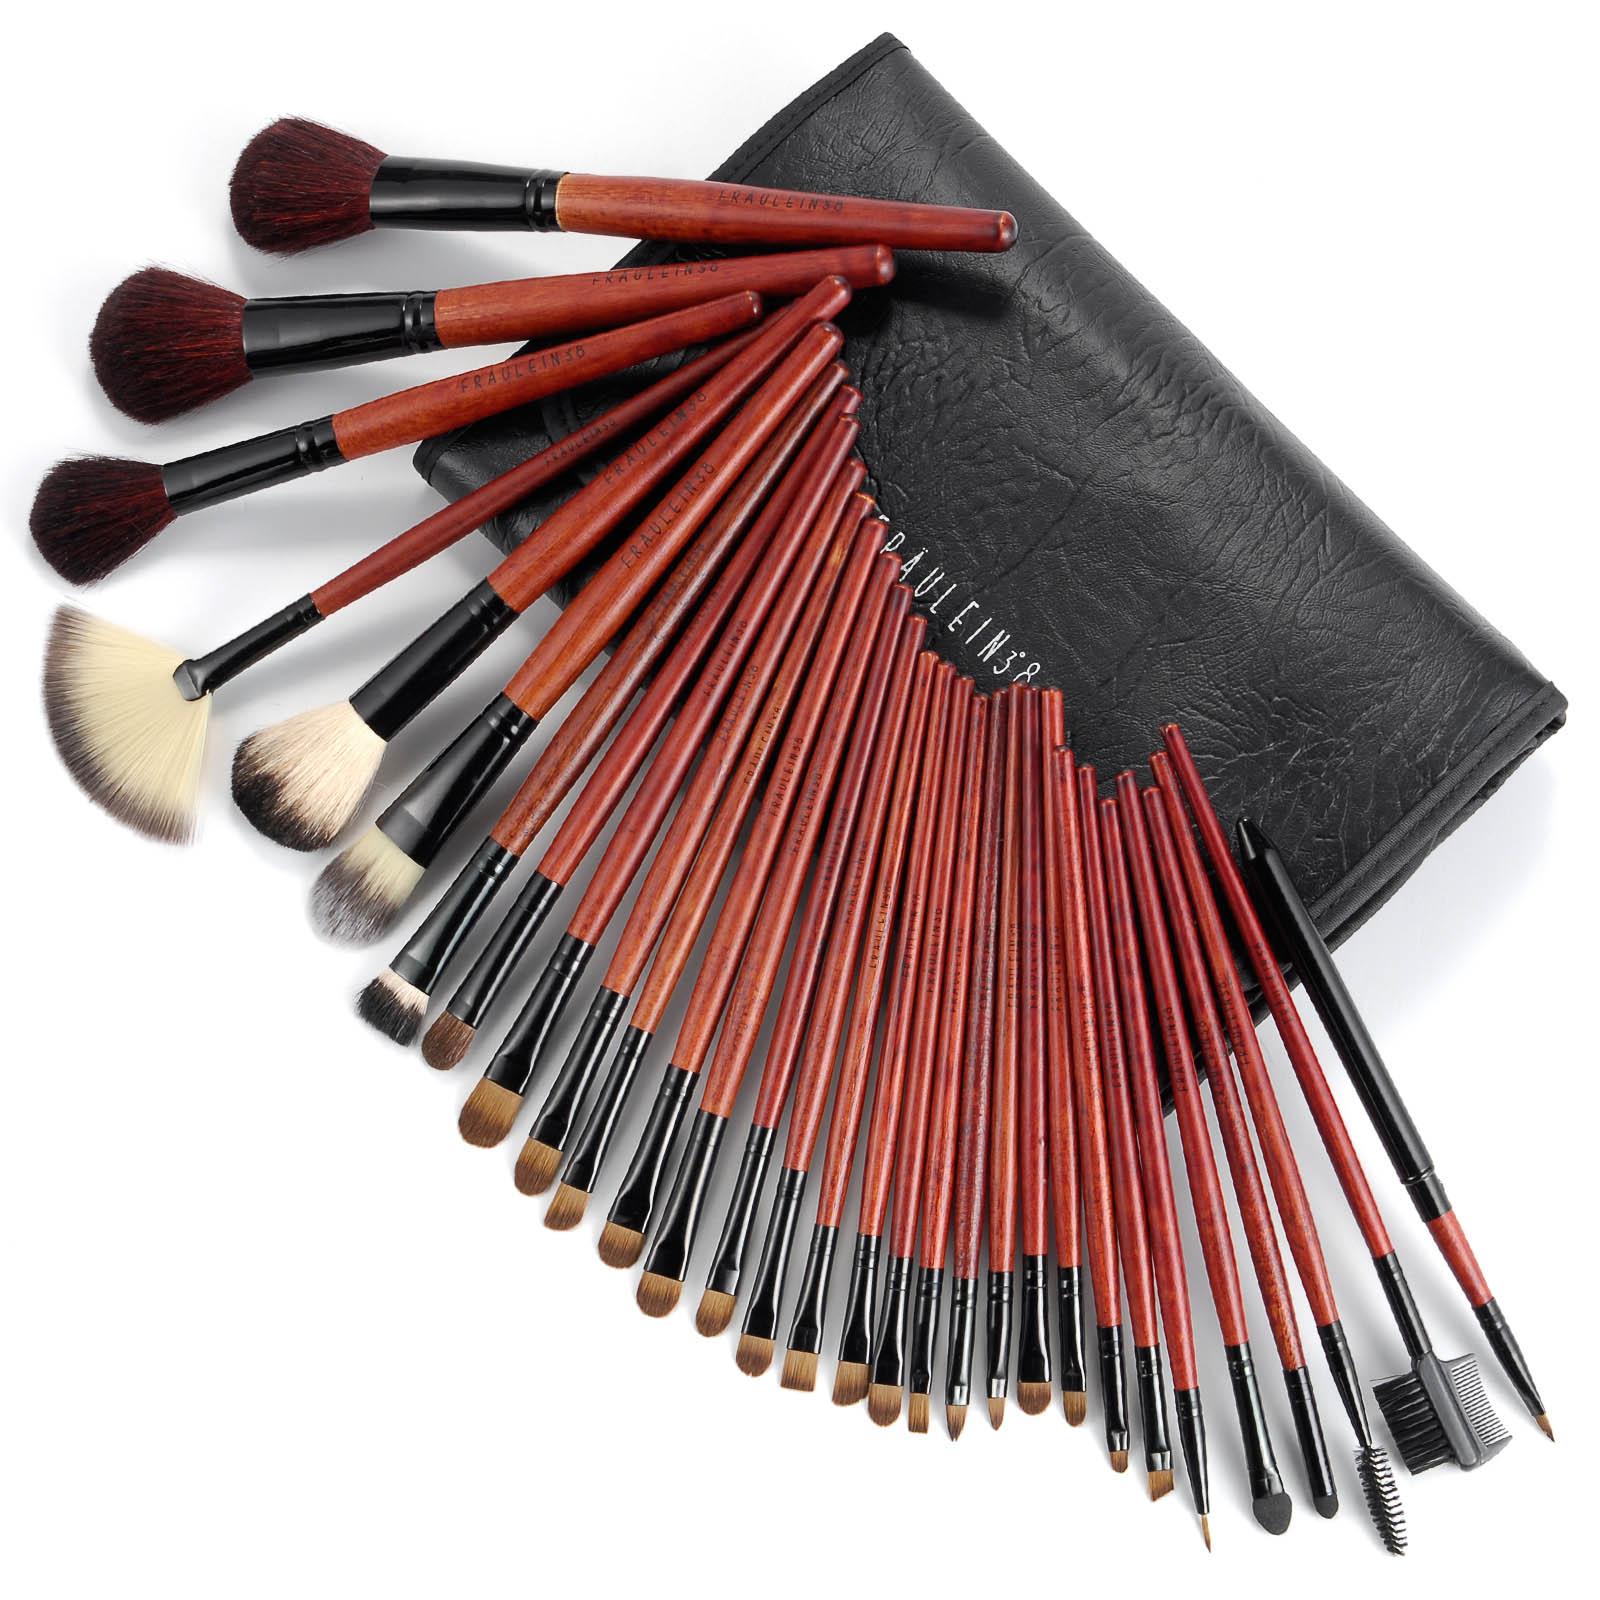 31pcs Professional Makeup Brushes Brush Wood Kit Cosmetic Set 36 Pcs Facial Make Up Tools With Black Leather Case X 31 1